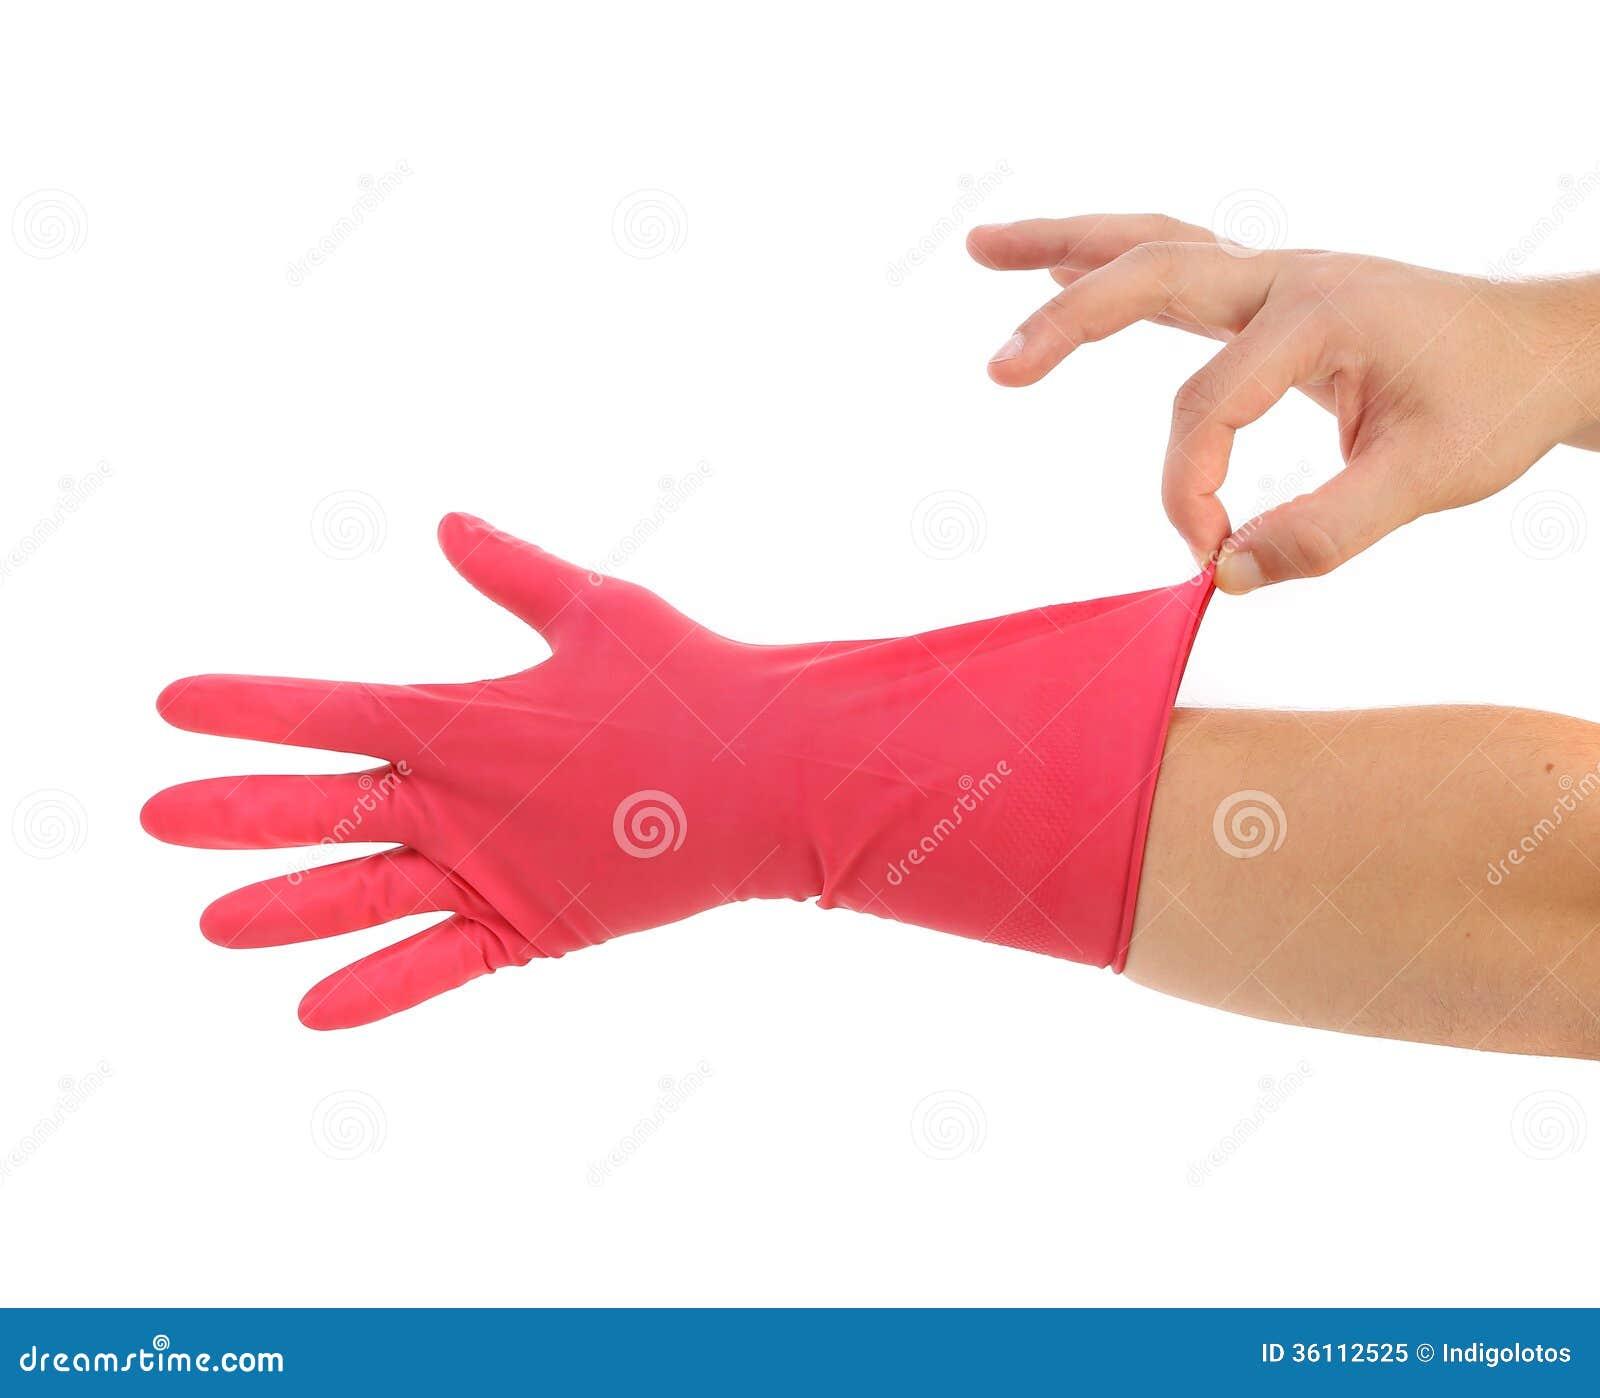 Rubber glove hand jobs down loads-3191